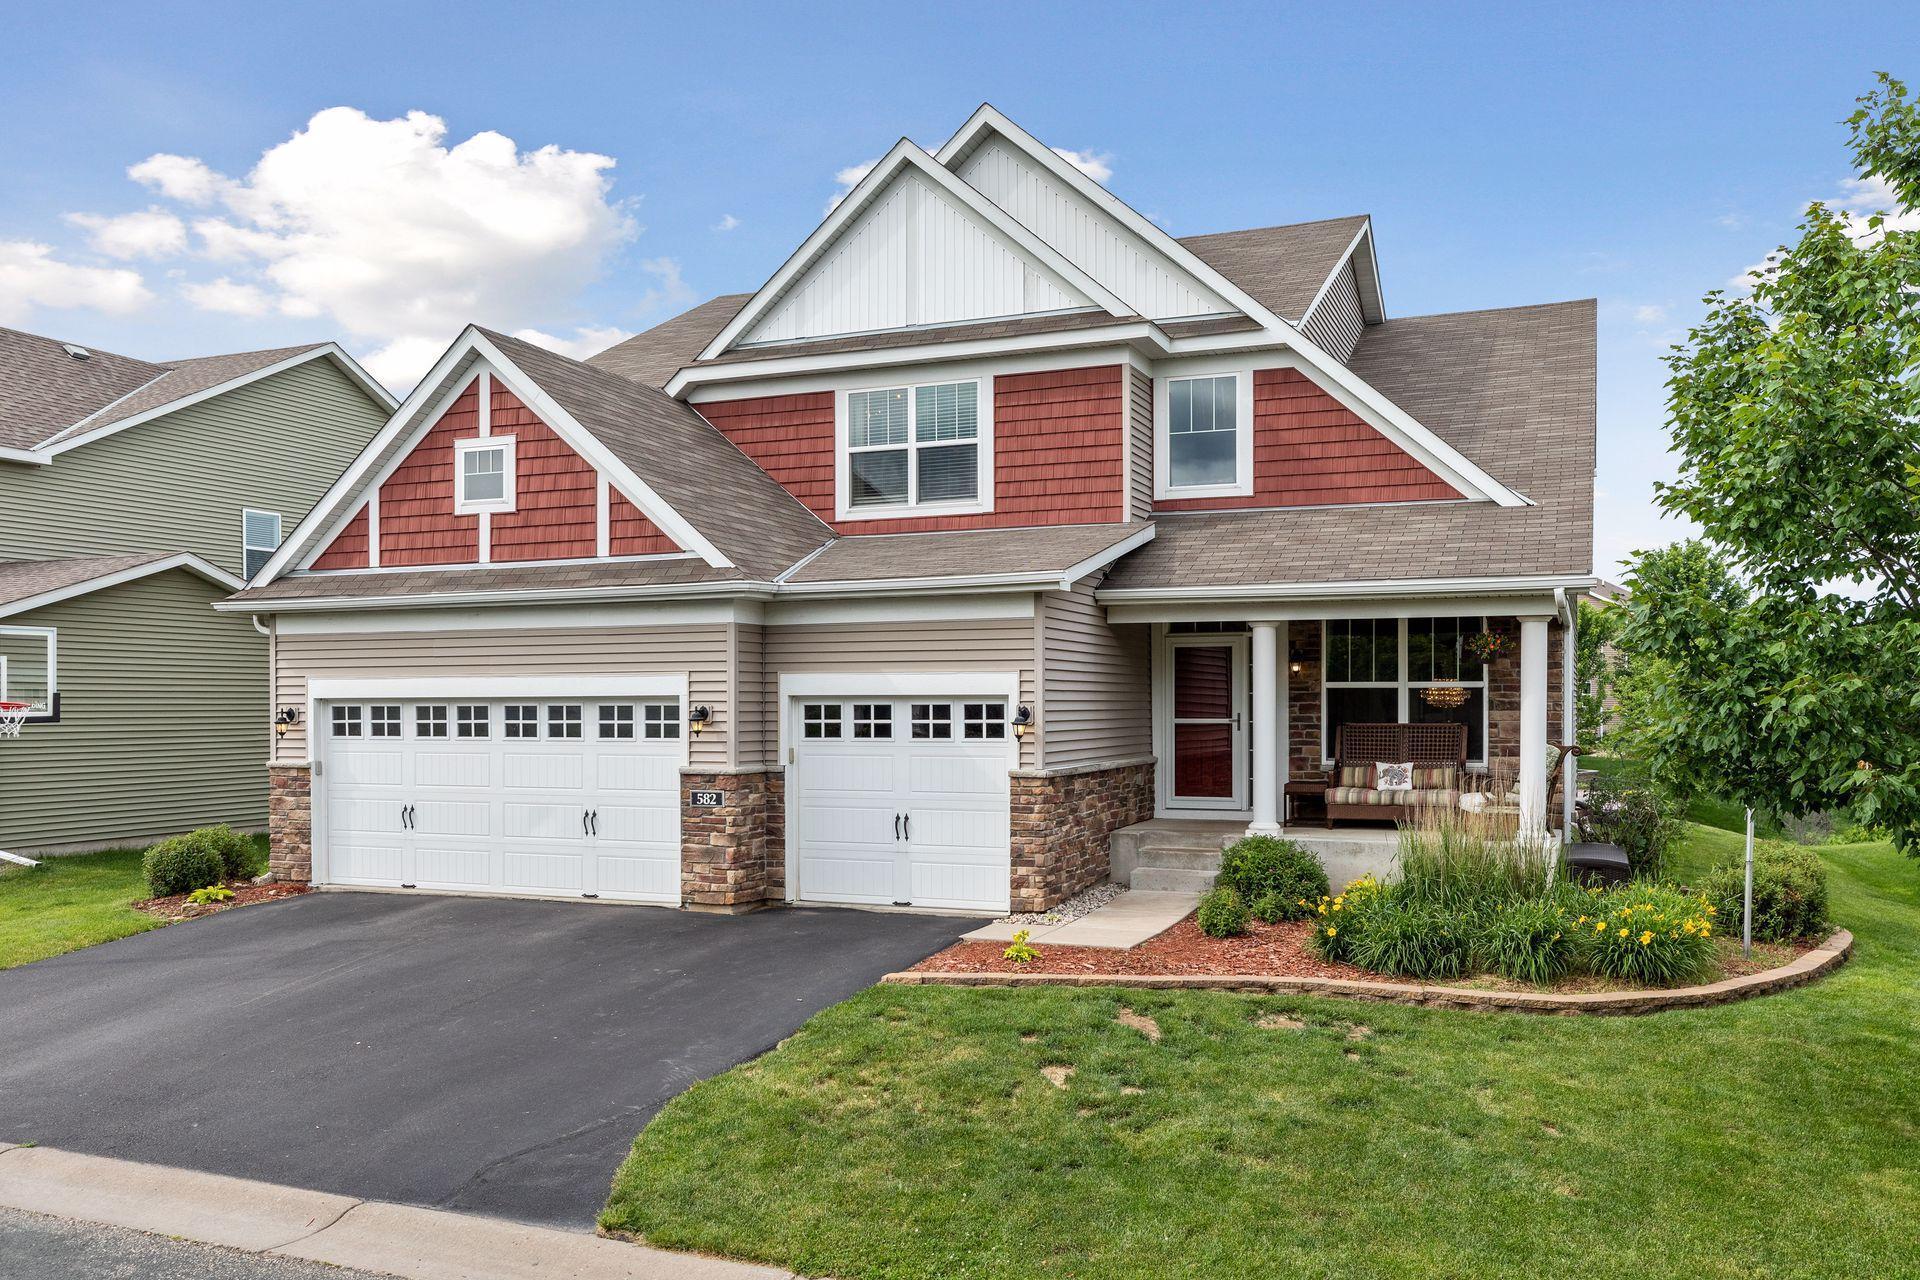 582 Eastgate Property Photo - Mahtomedi, MN real estate listing